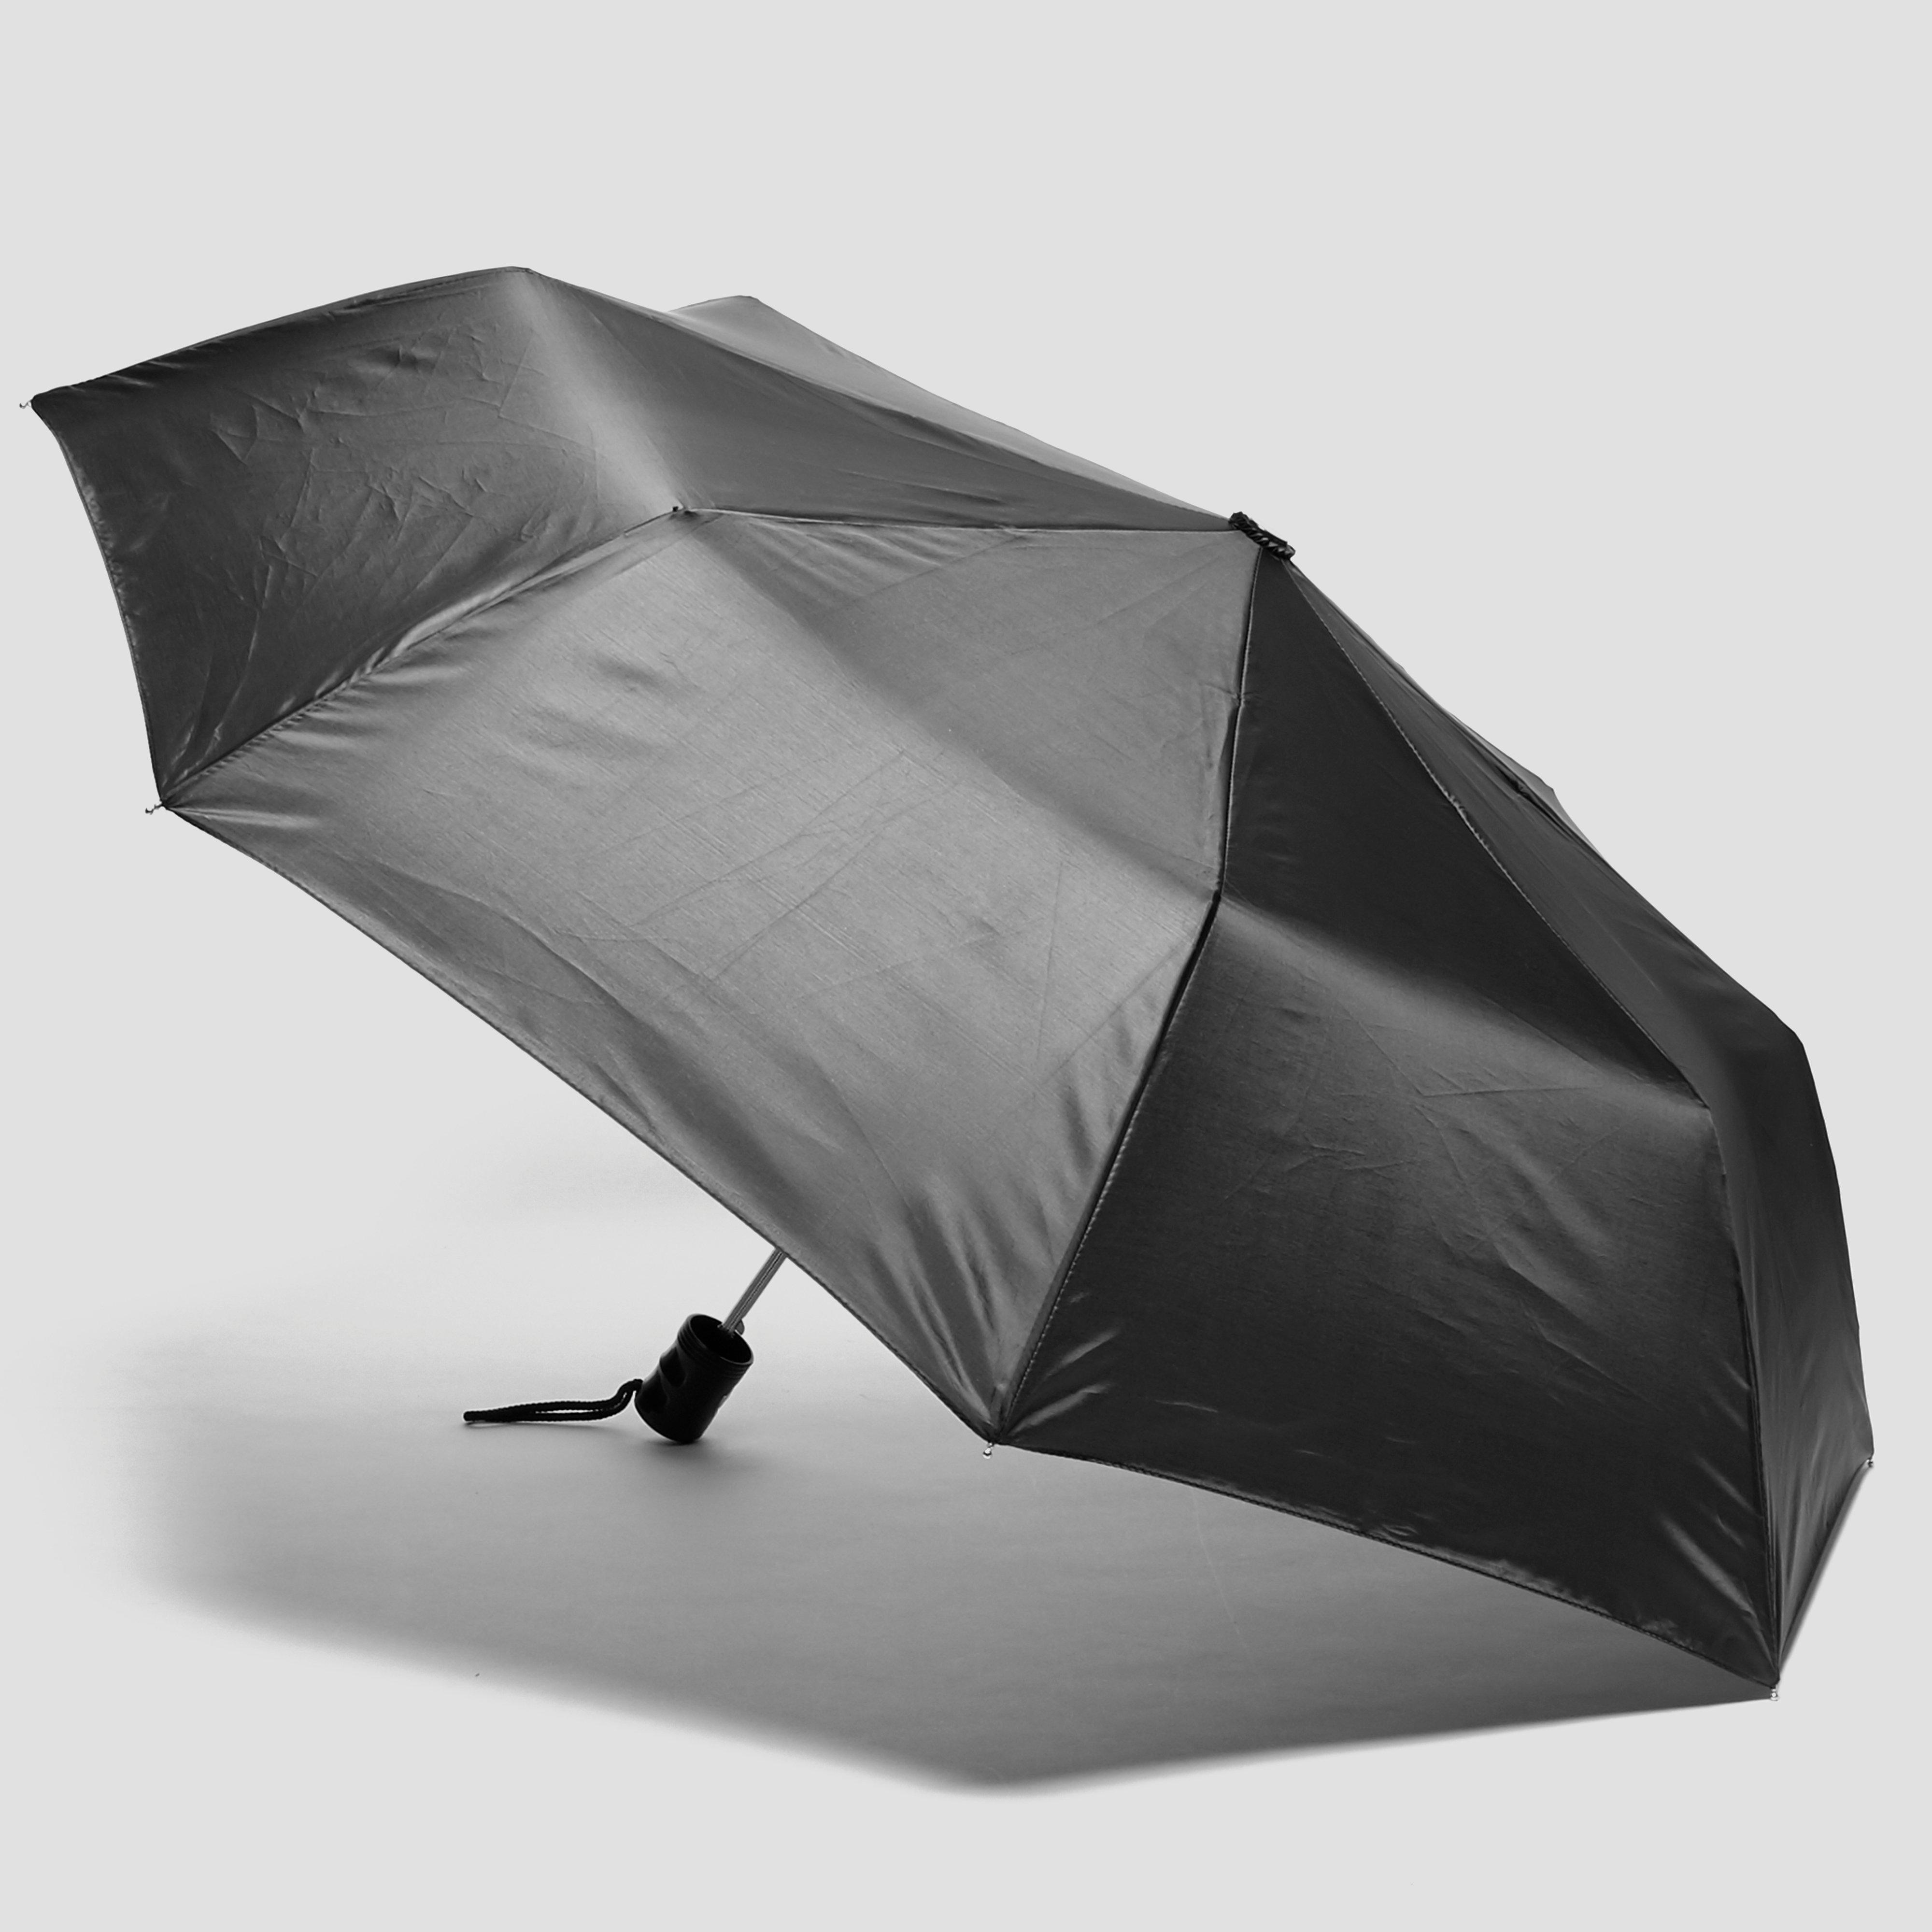 Image of Peter Storm Women's Pop-Up Umbrella - Black/Blk, Black/BLK